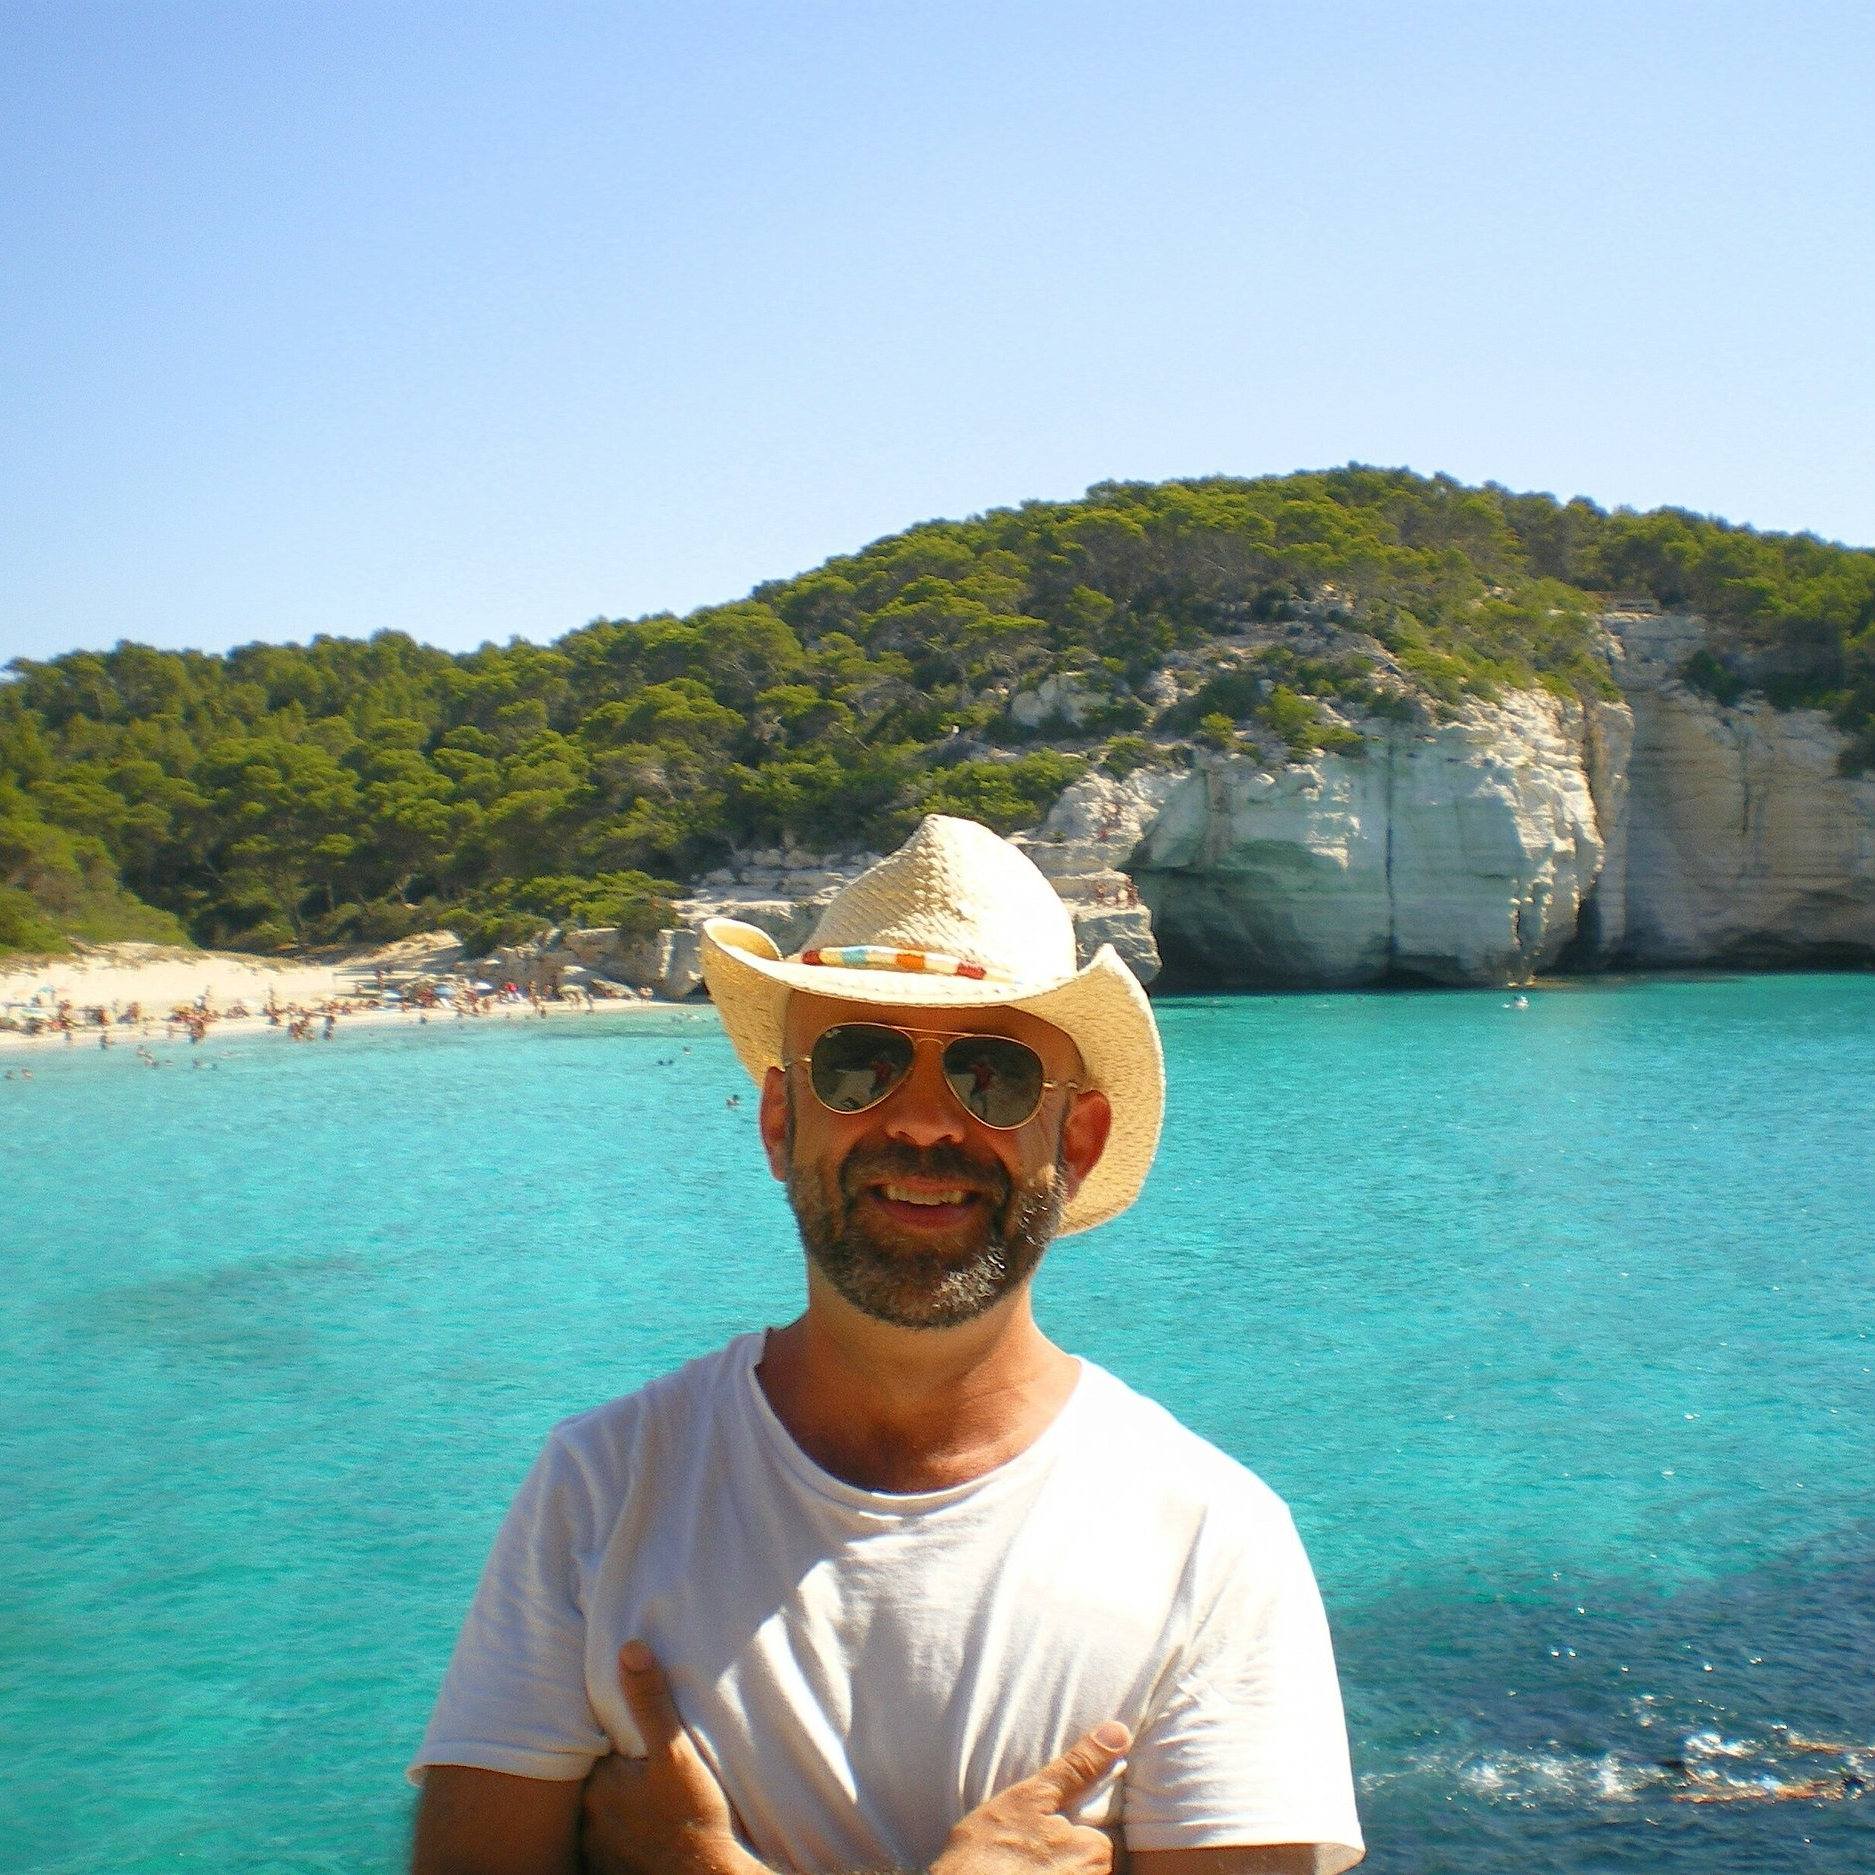 Claudio in his favorite vacation spot, Menorca